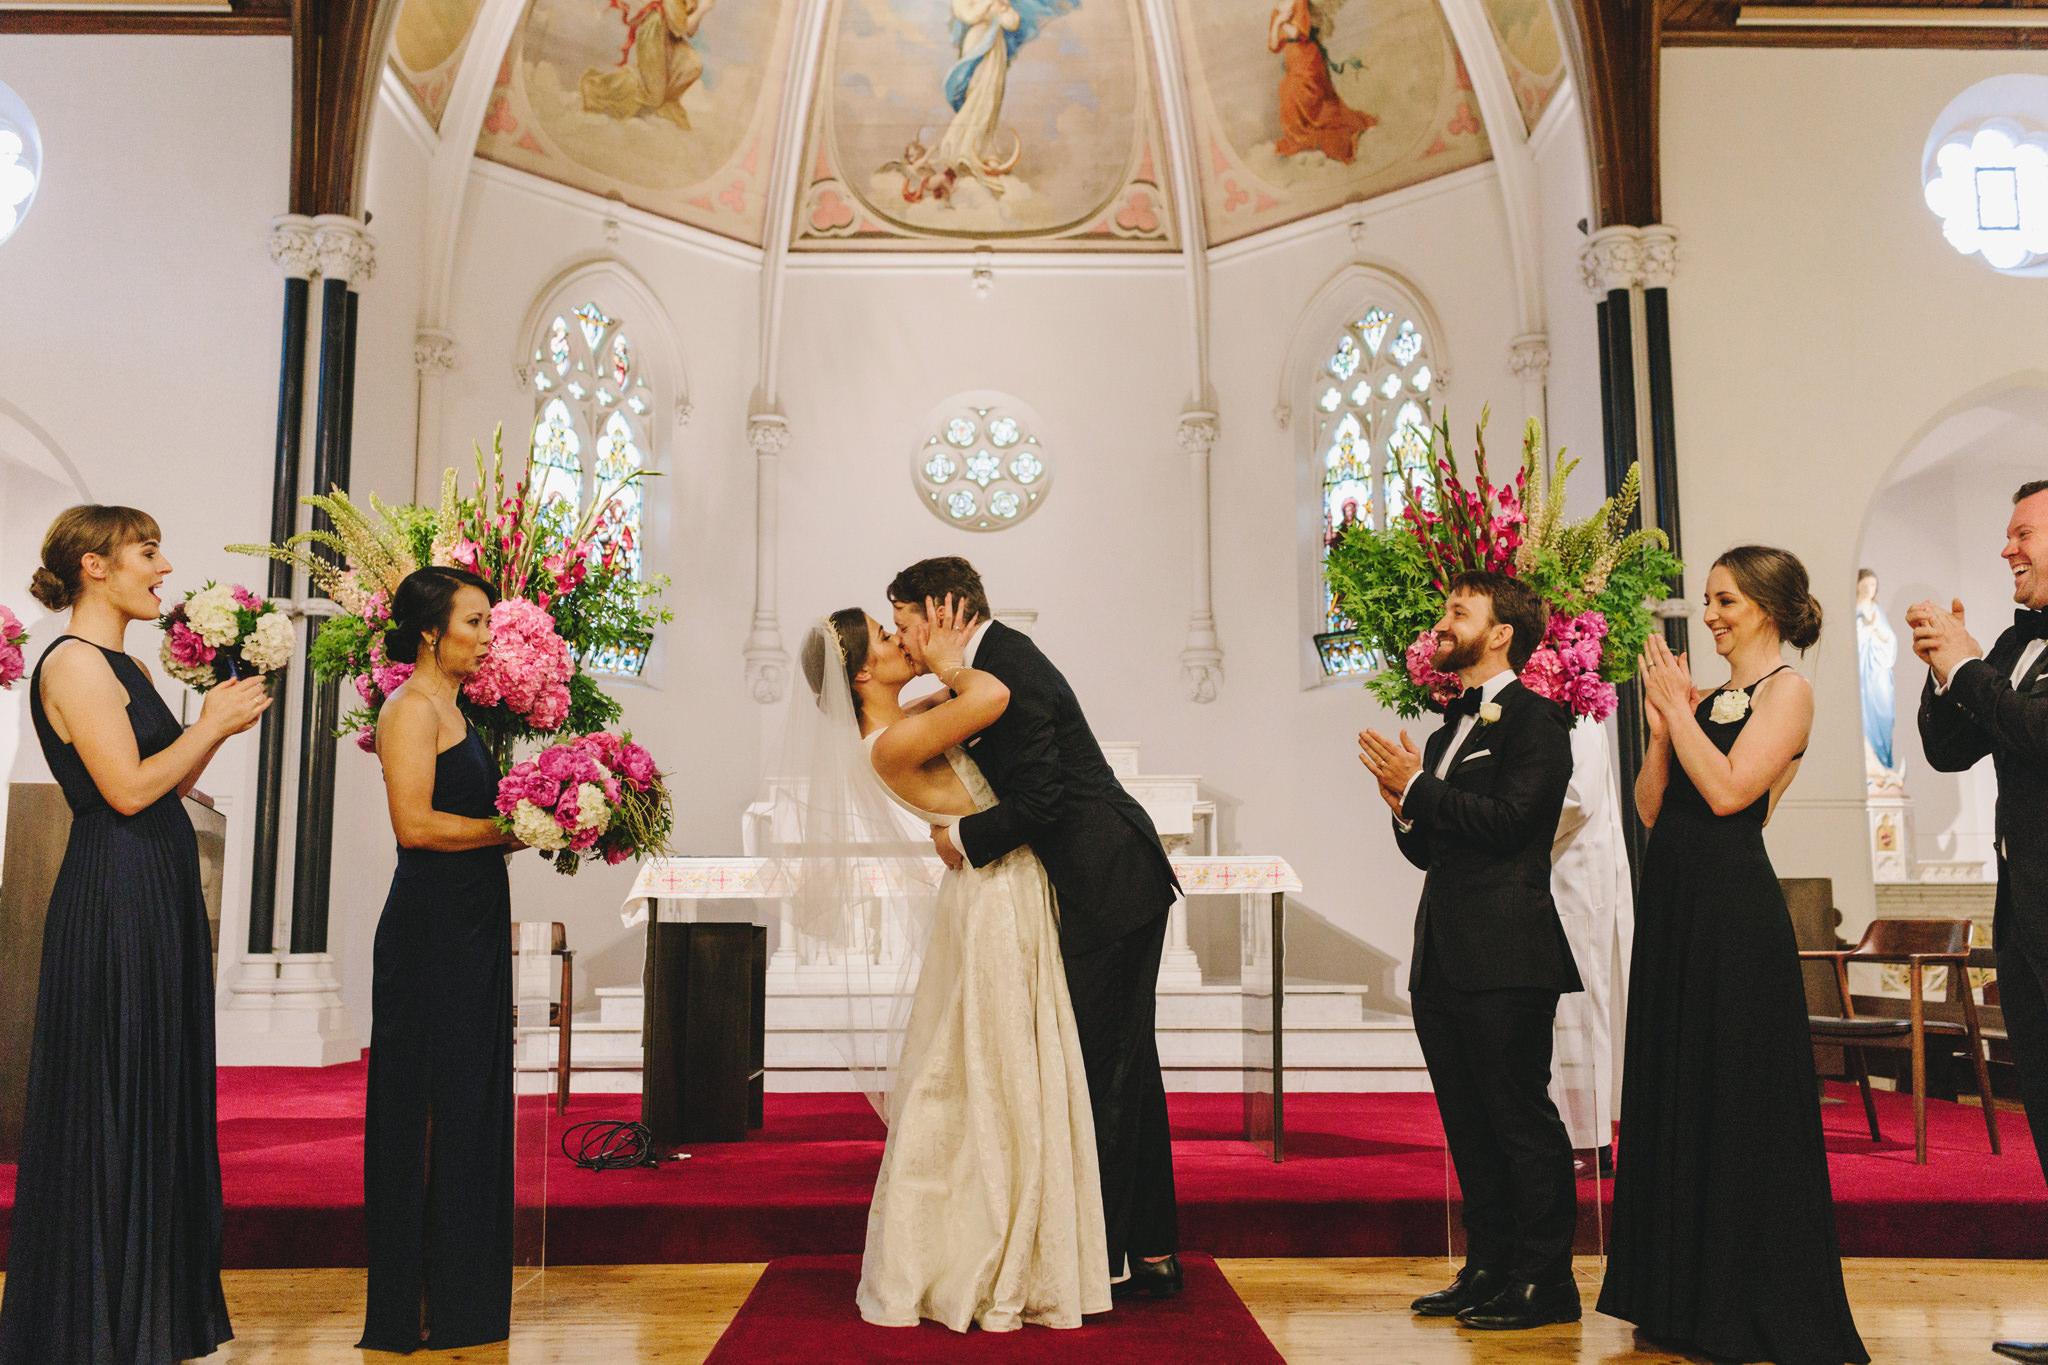 Abbotsford_Convent_Wedding_Peter_Anna065.JPG